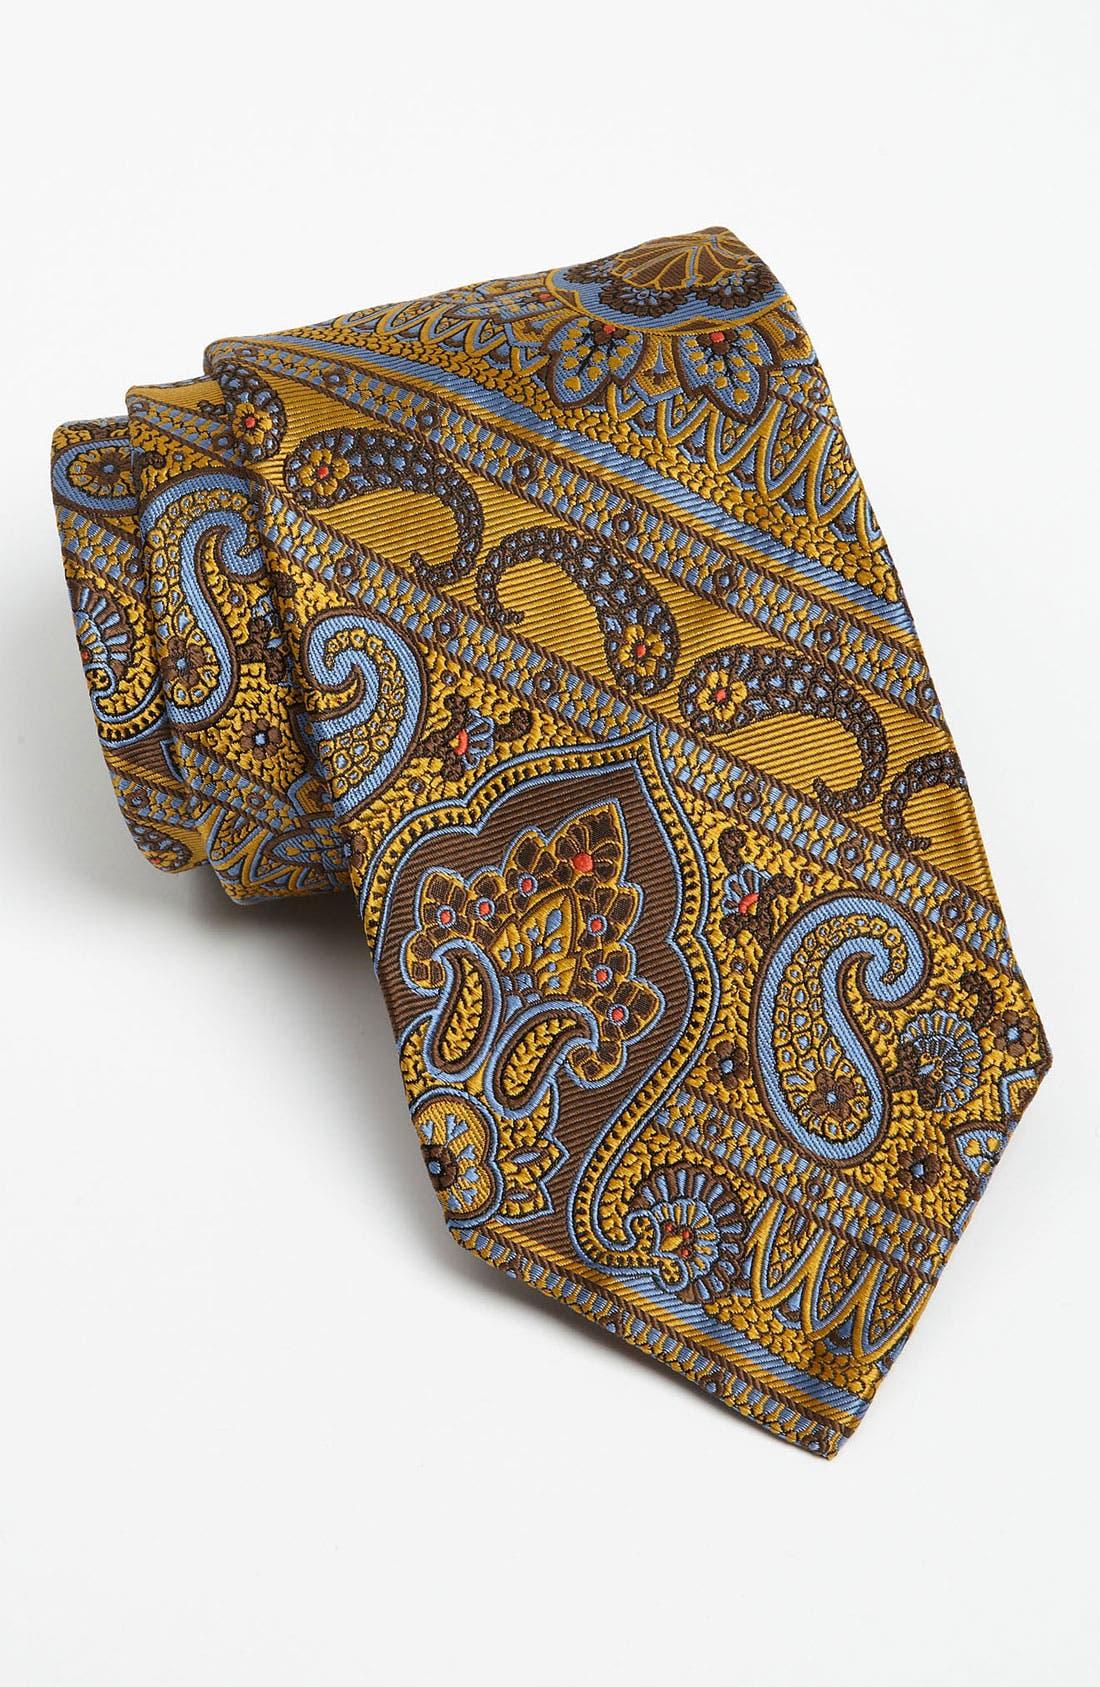 Alternate Image 1 Selected - Robert Talbott 'Sevenfold' Silk Tie (Limited Edition)